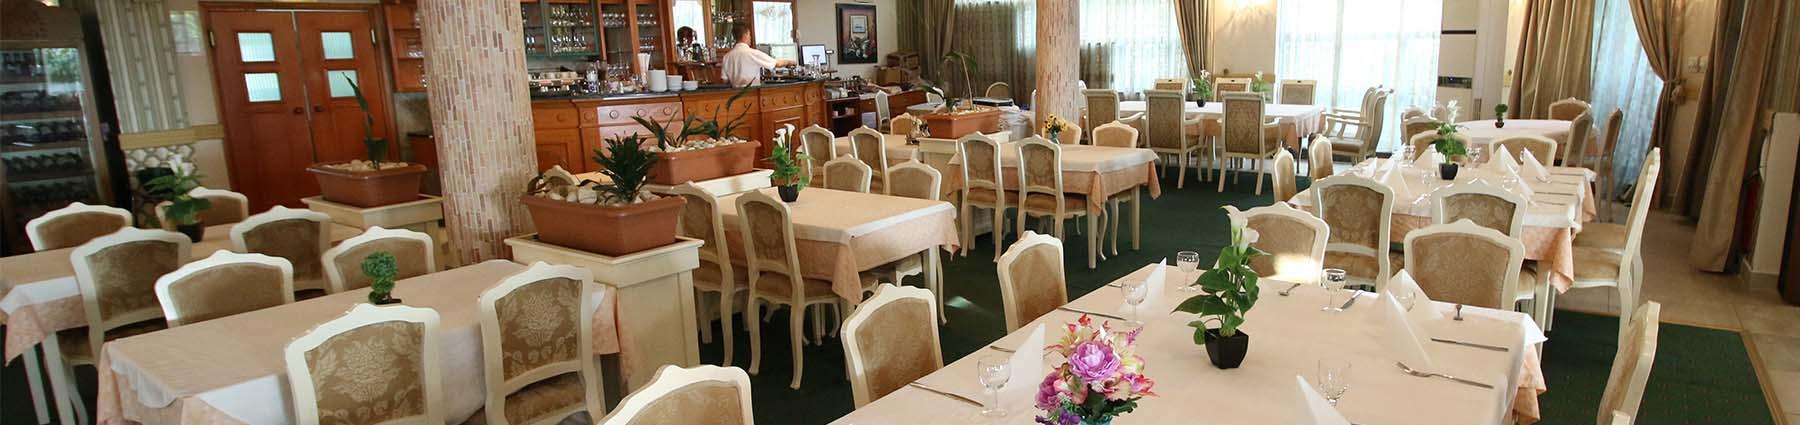 Ресторан Милениум Палас